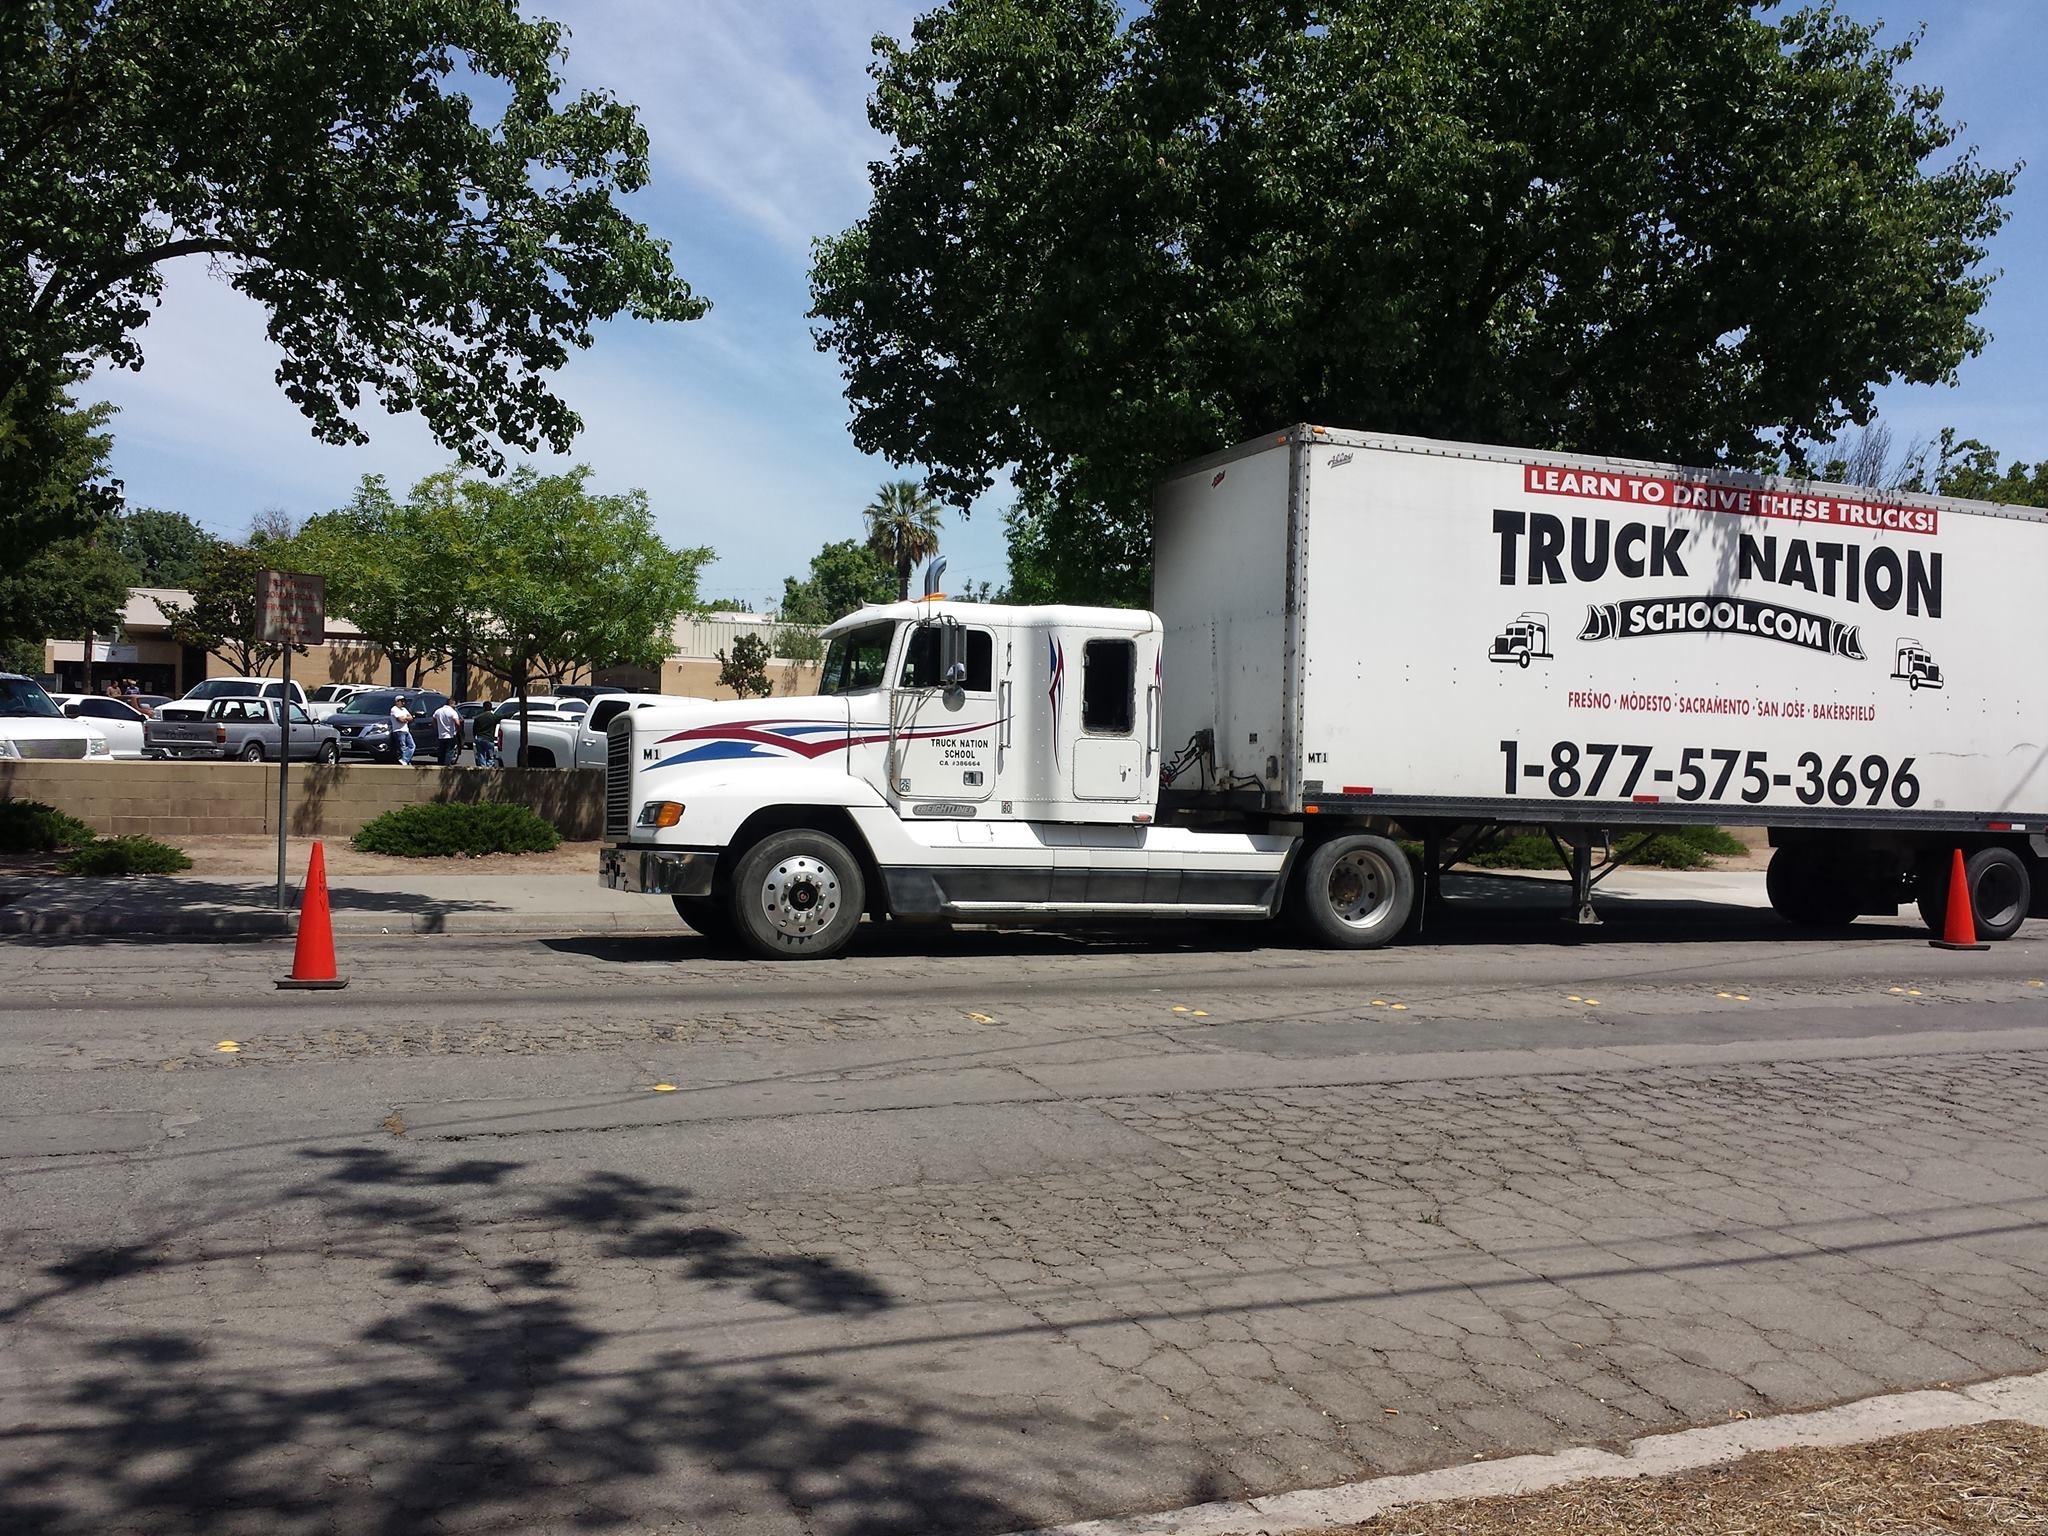 Truck Nation School image 1